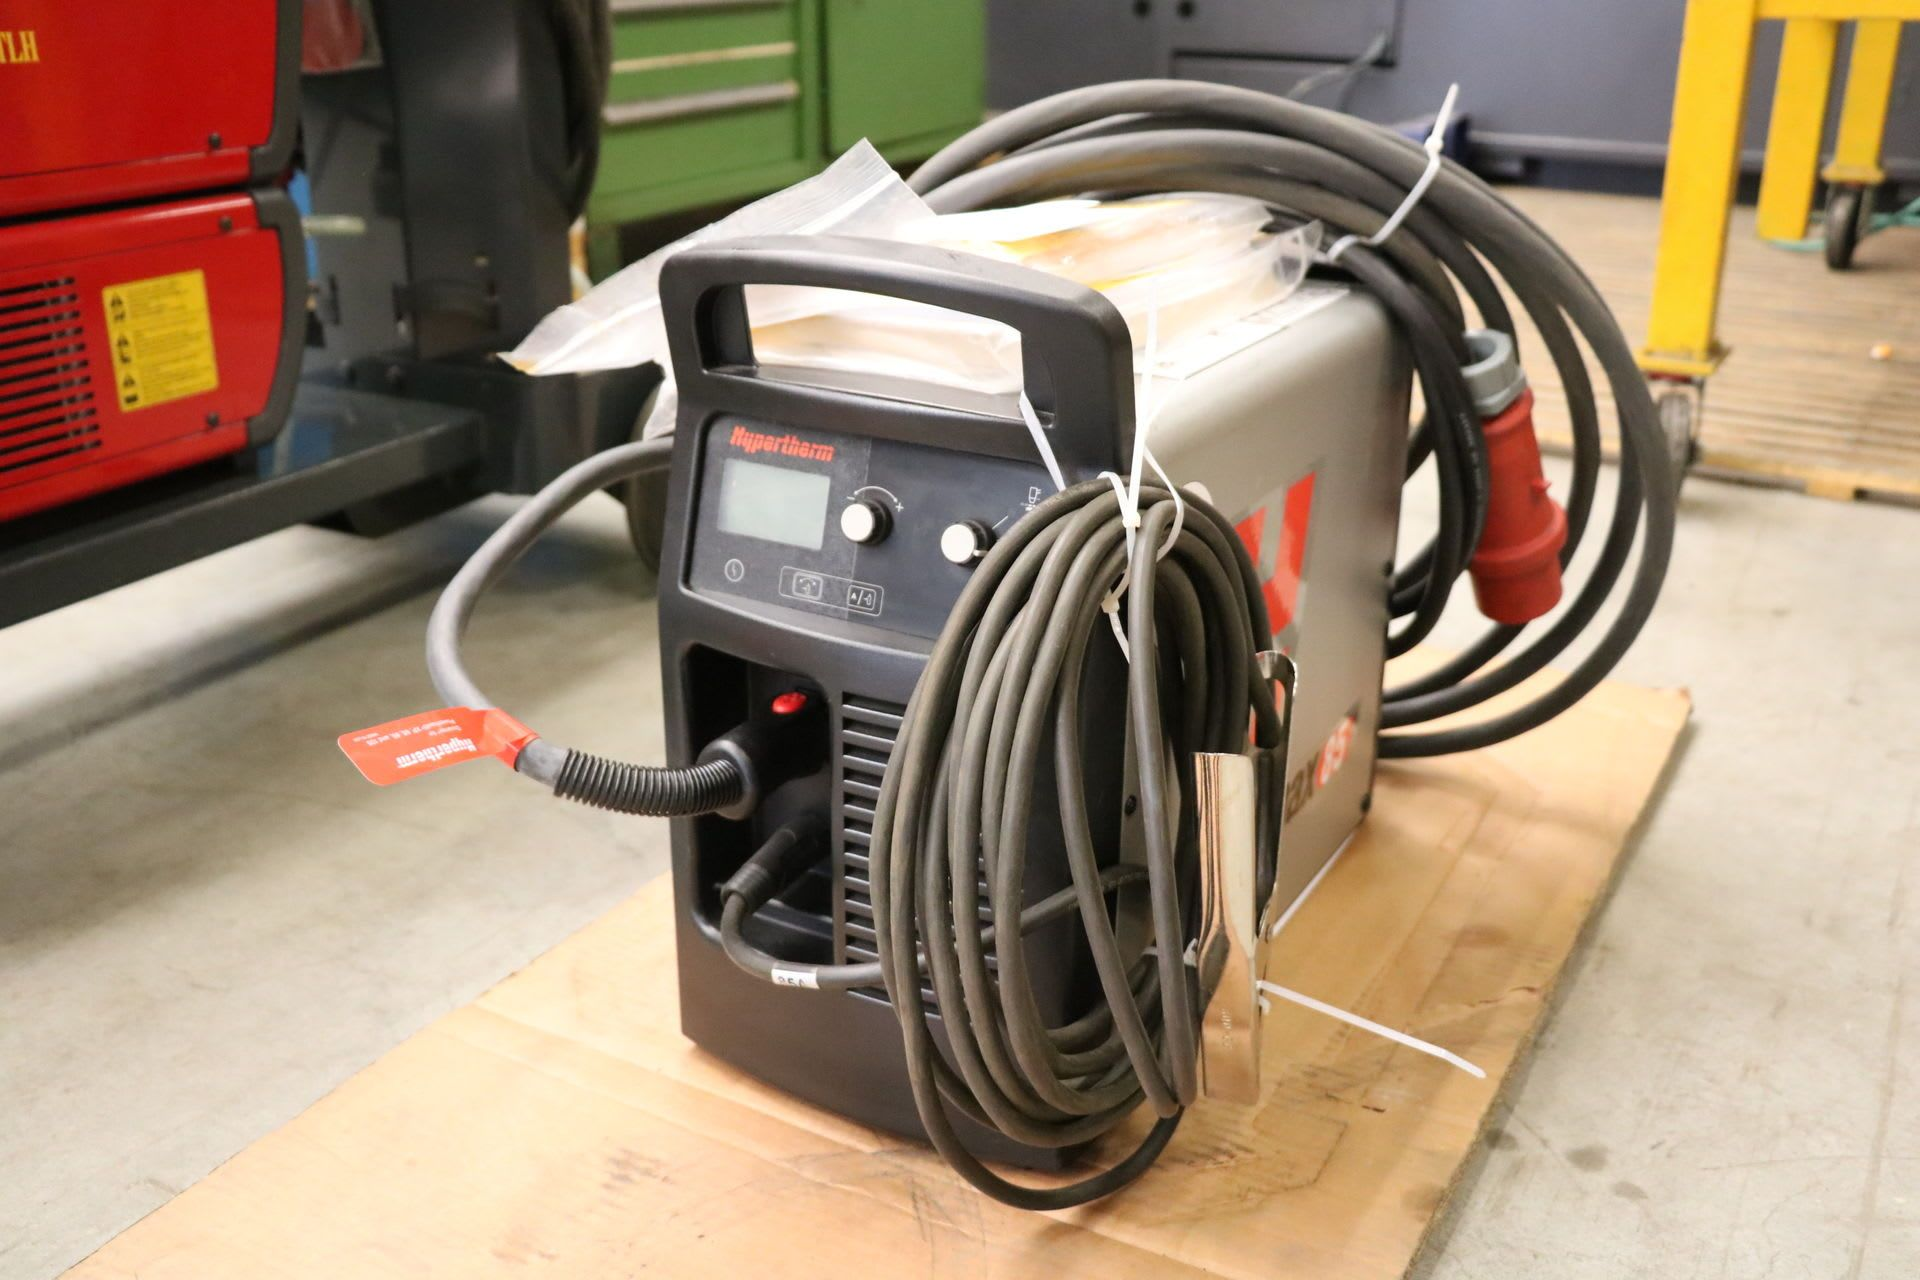 HYPERTHERM POWERMAX 85 Plasmaschneider